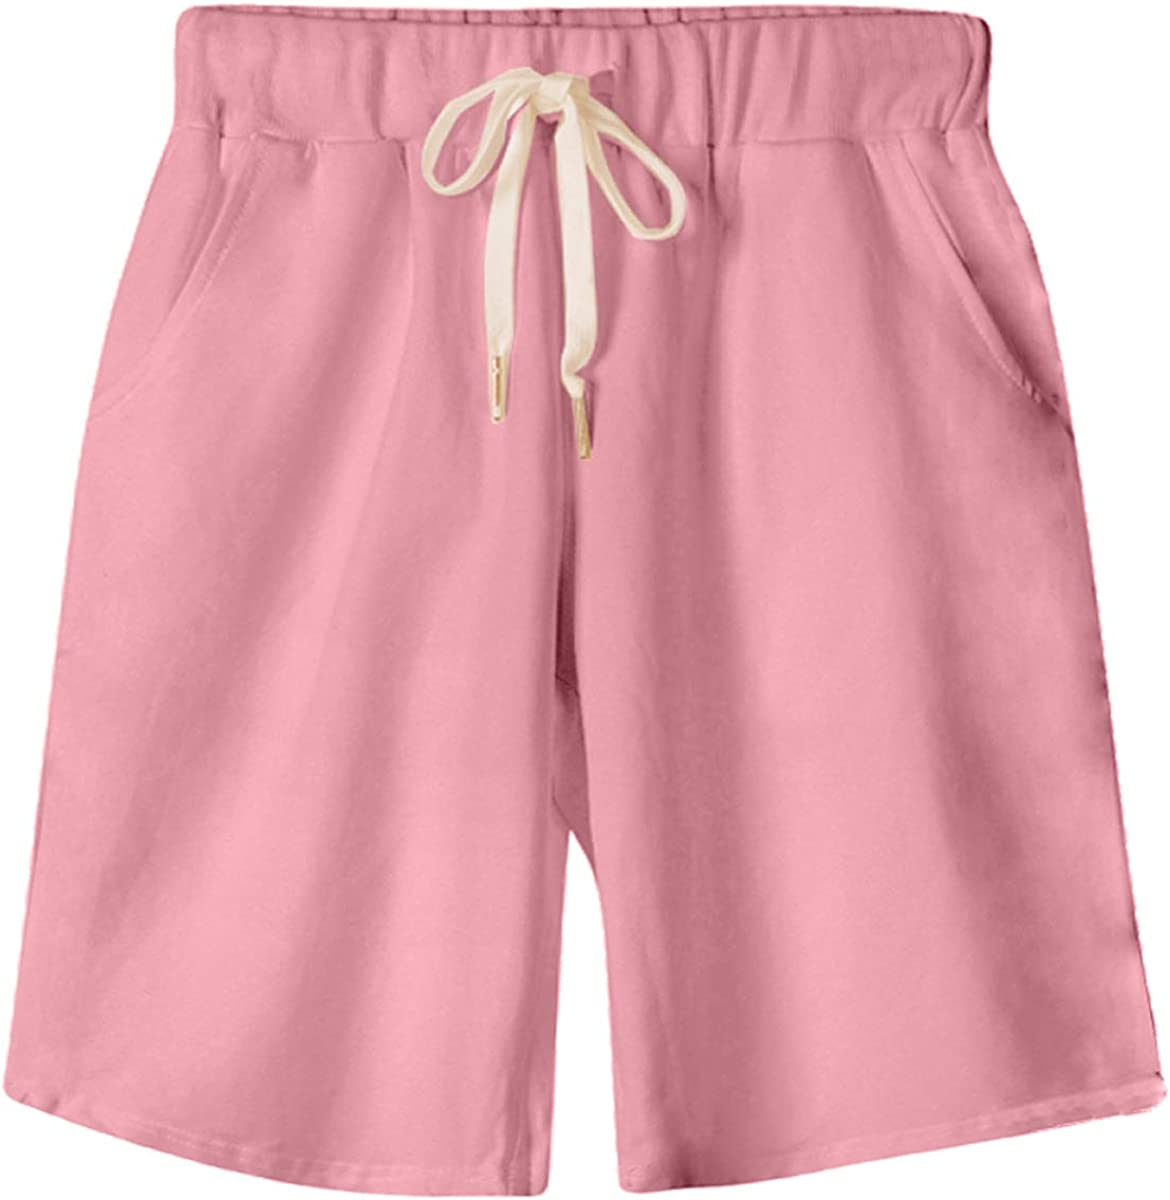 Fuwenni Women's Elastic Waist Shorts Soft Knit Jersey Knee Length Bermuda Shorts with Drawstring